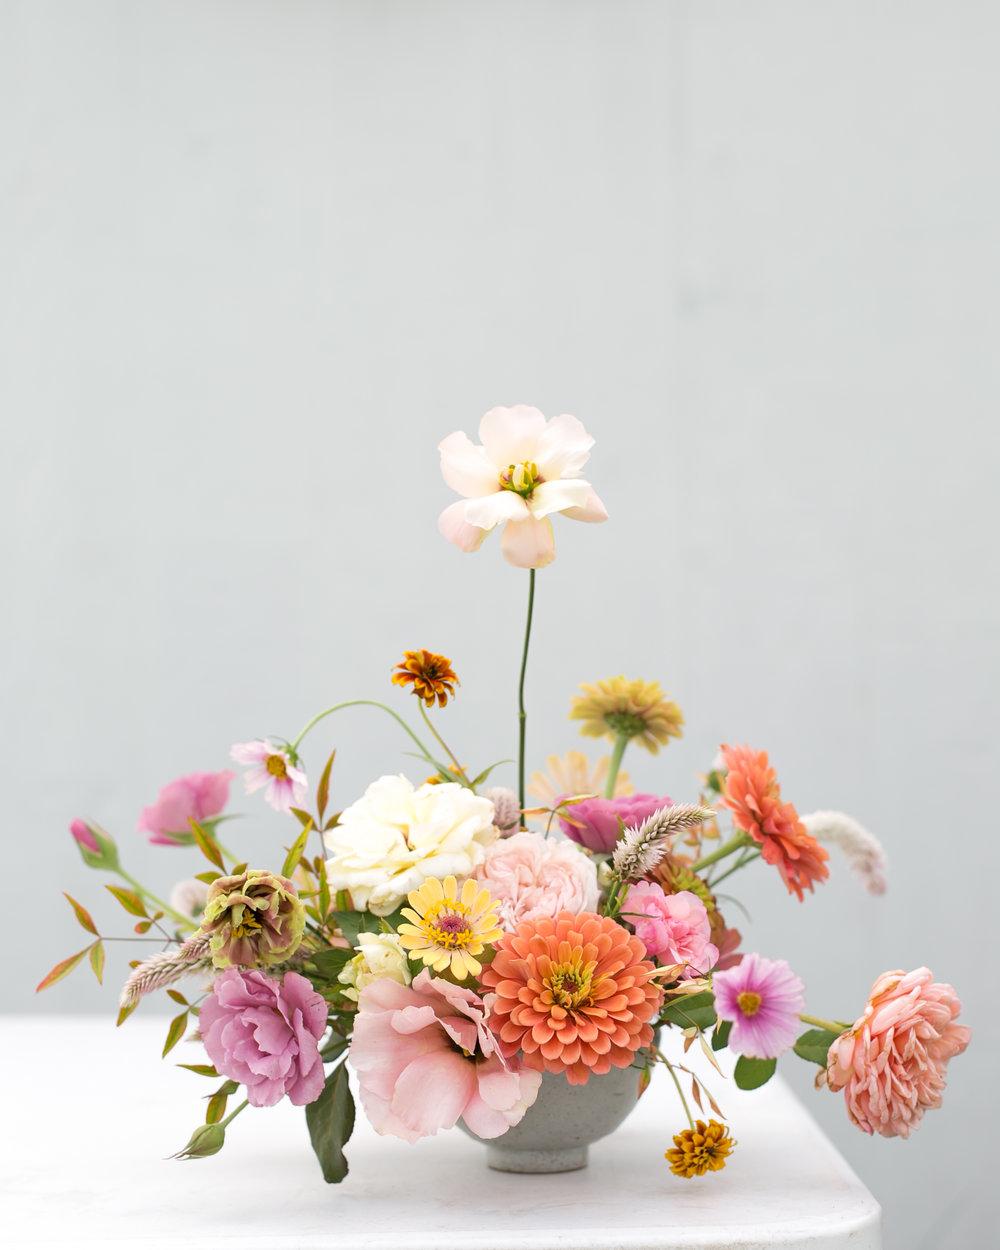 fallflowers-4.jpg